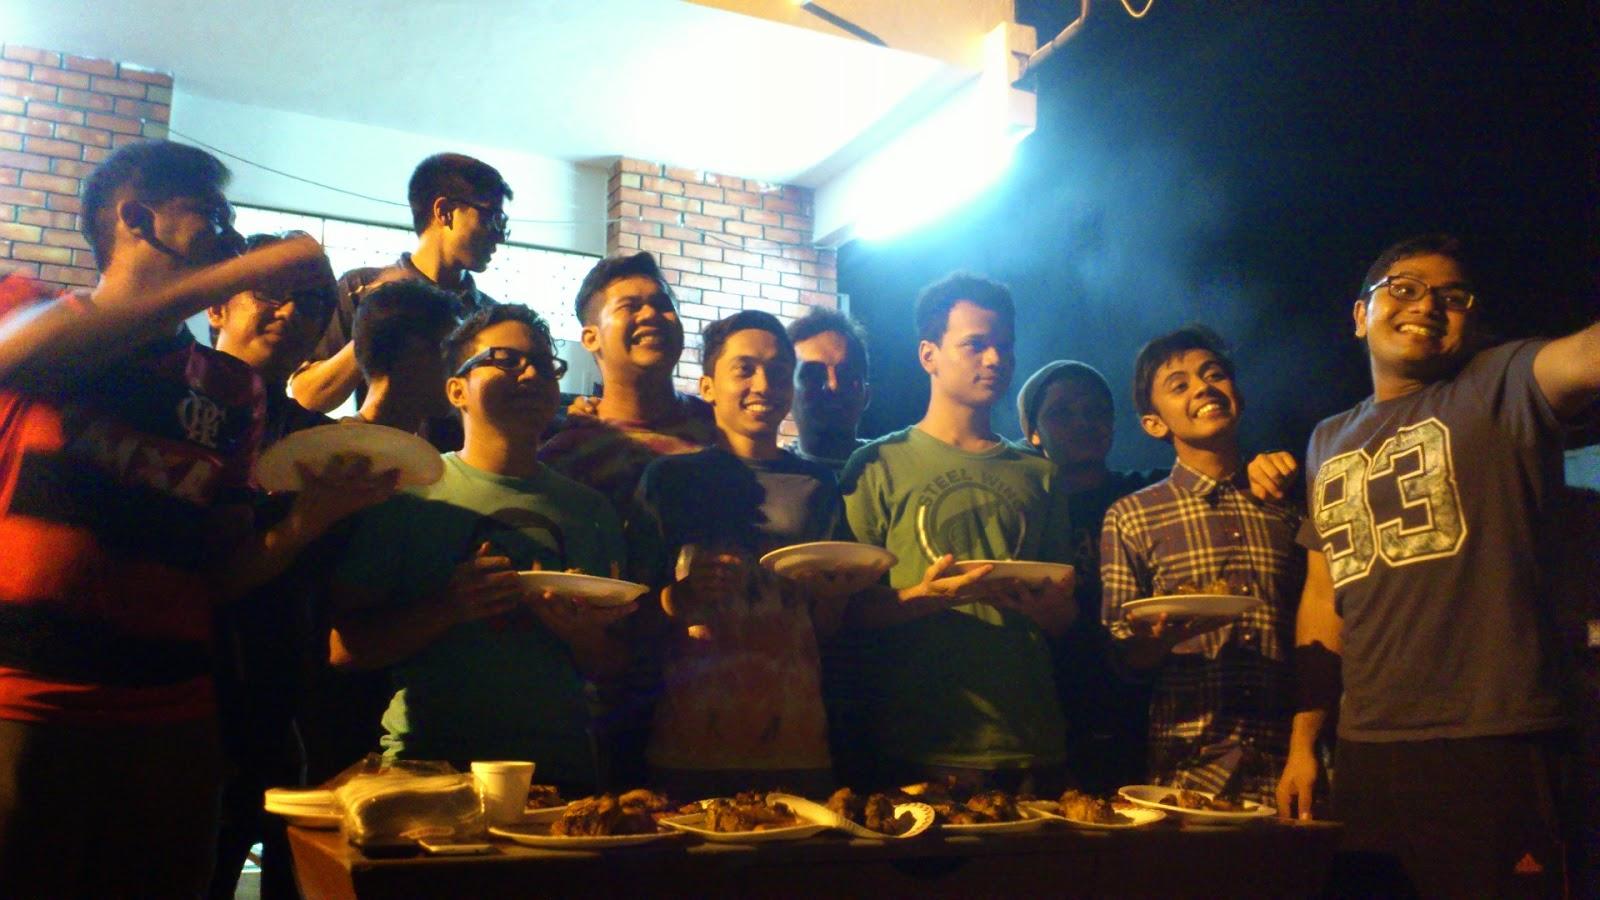 Reunion MRSM Kepala Batas 2nd Batch di PD .:TEASER:.